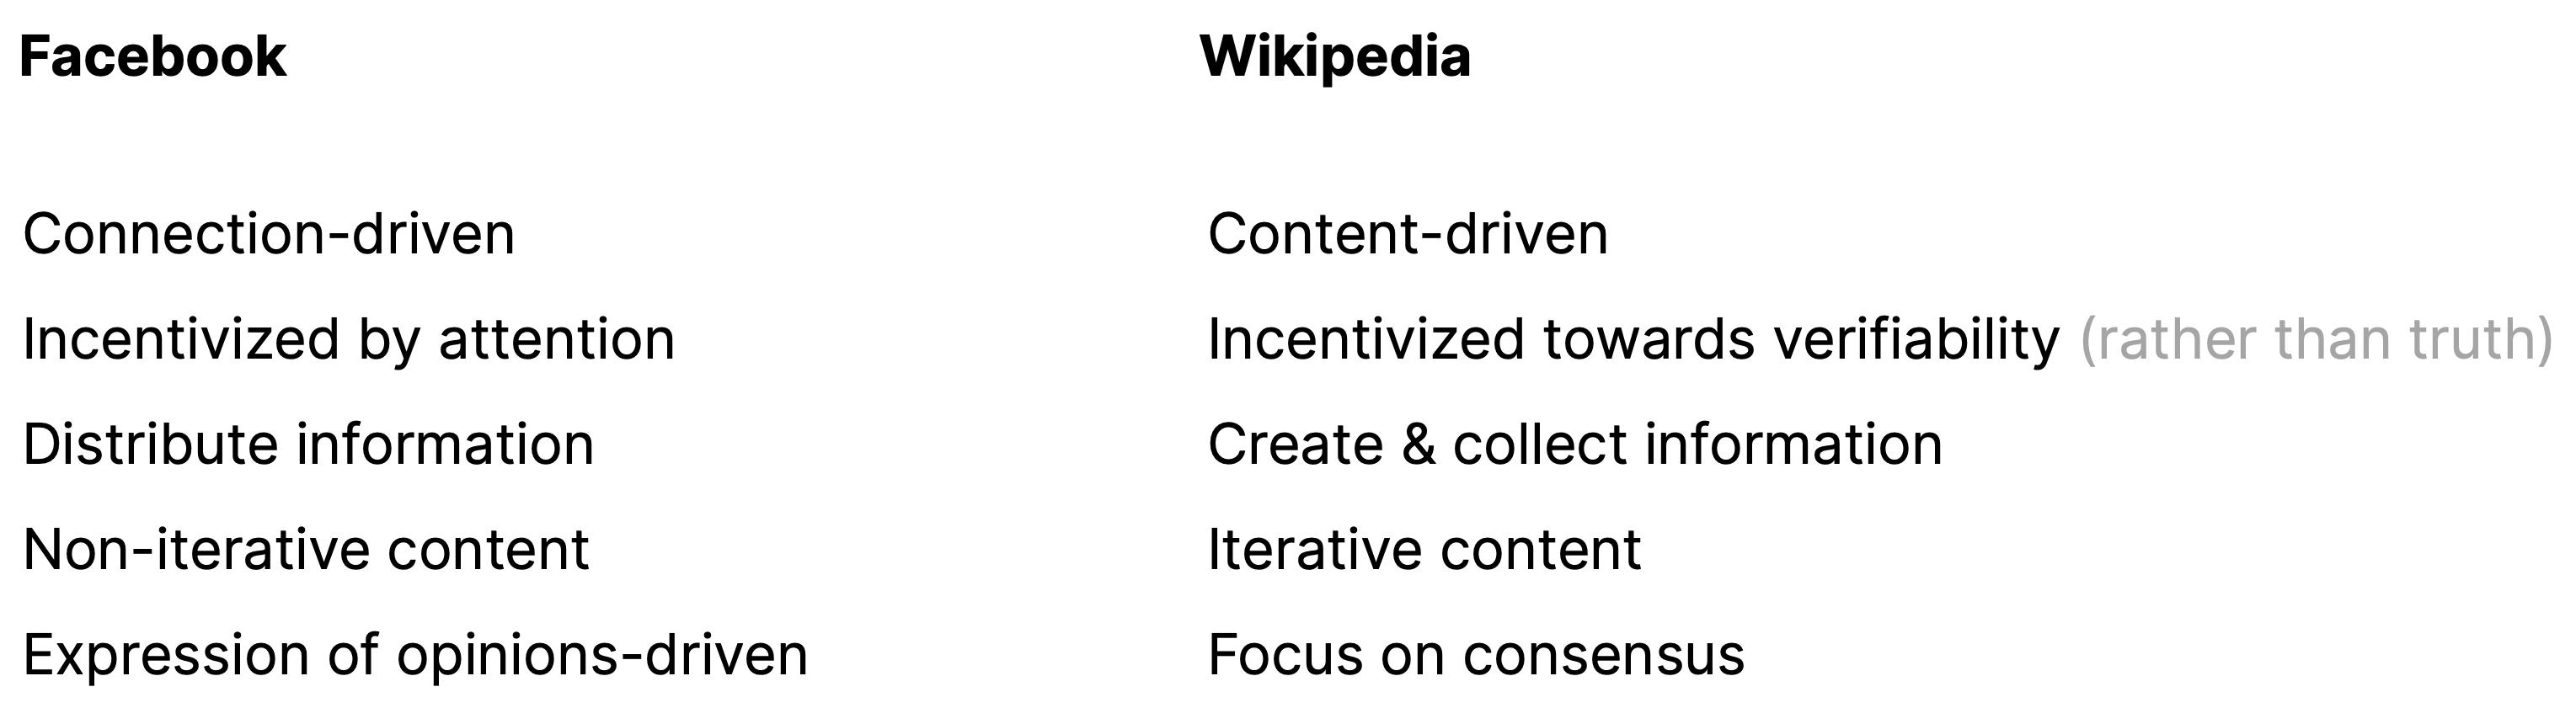 Comparing Facebook and Wiki @Tara Lin